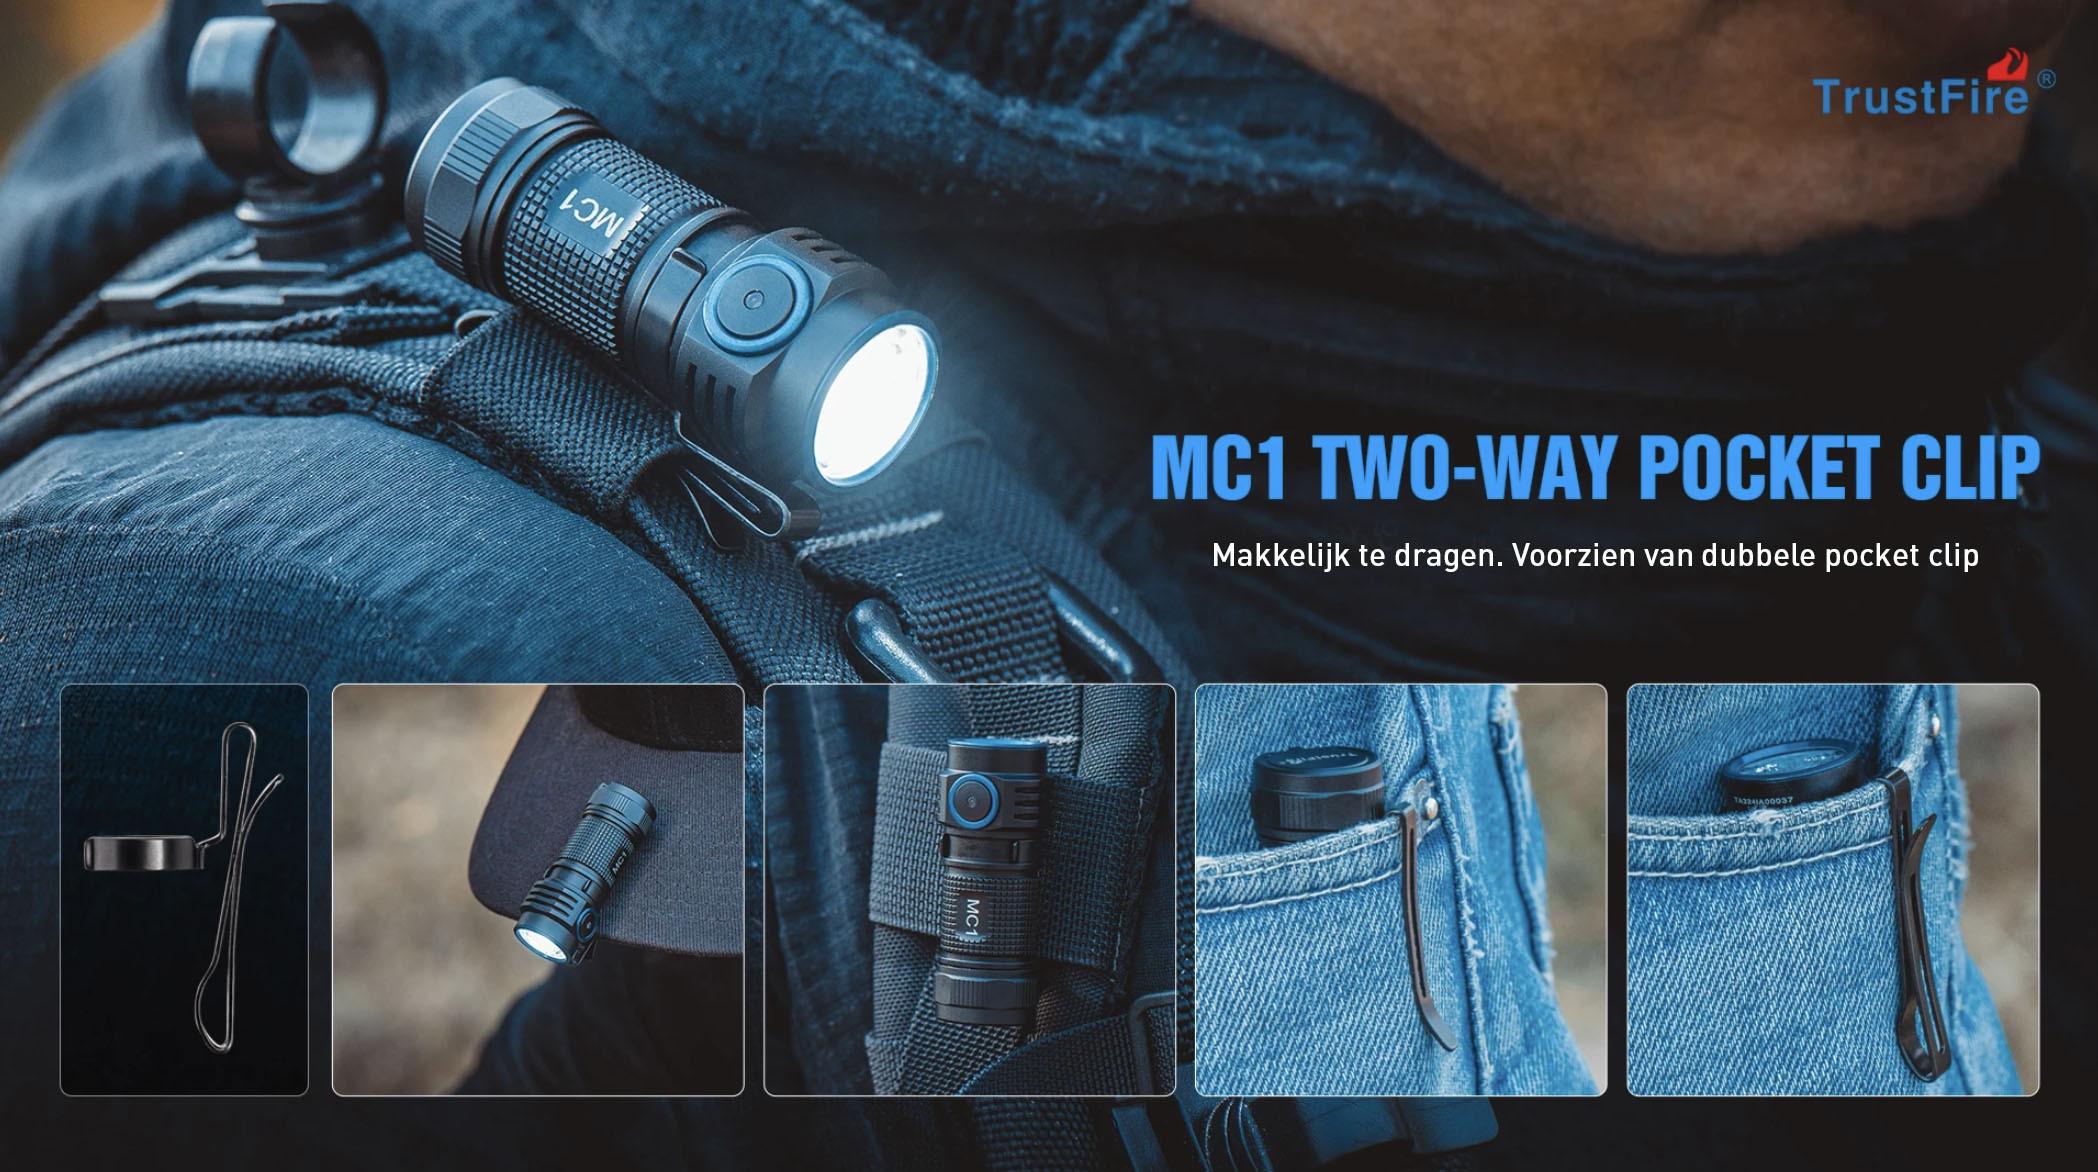 MC1 Zaklamp 1000 lumen - Trustfire